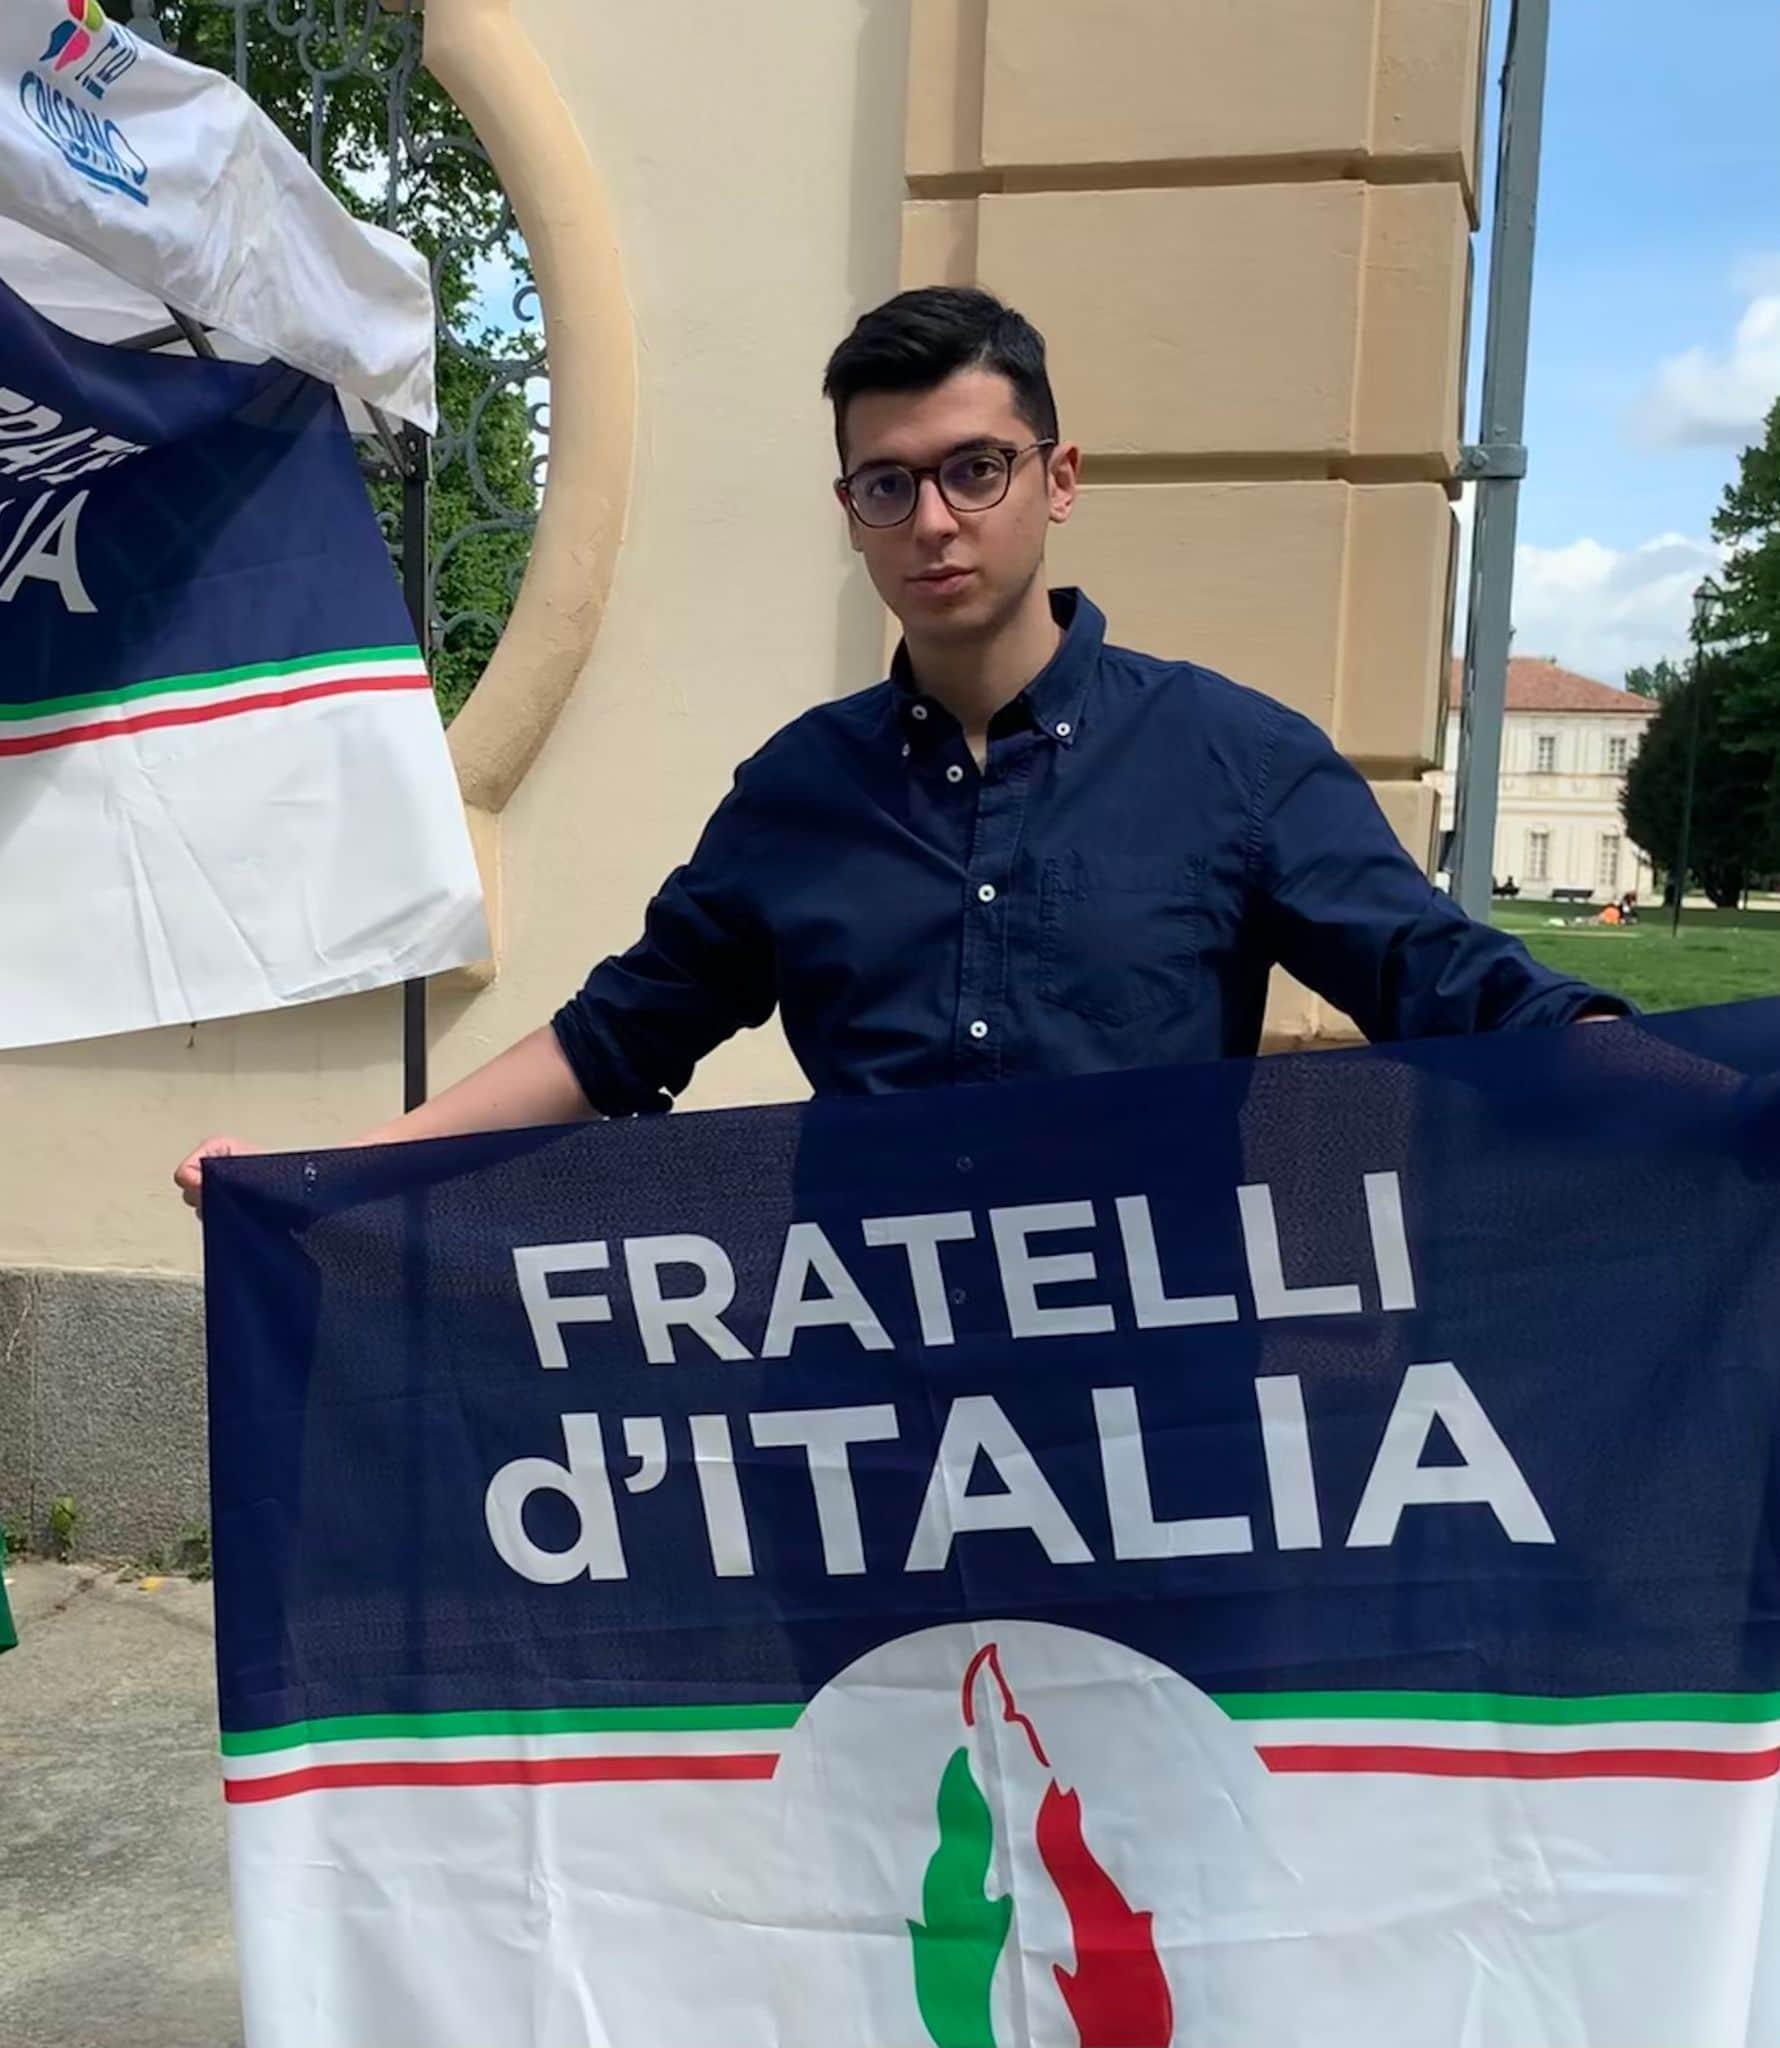 intervista marascio fratelli d'italia